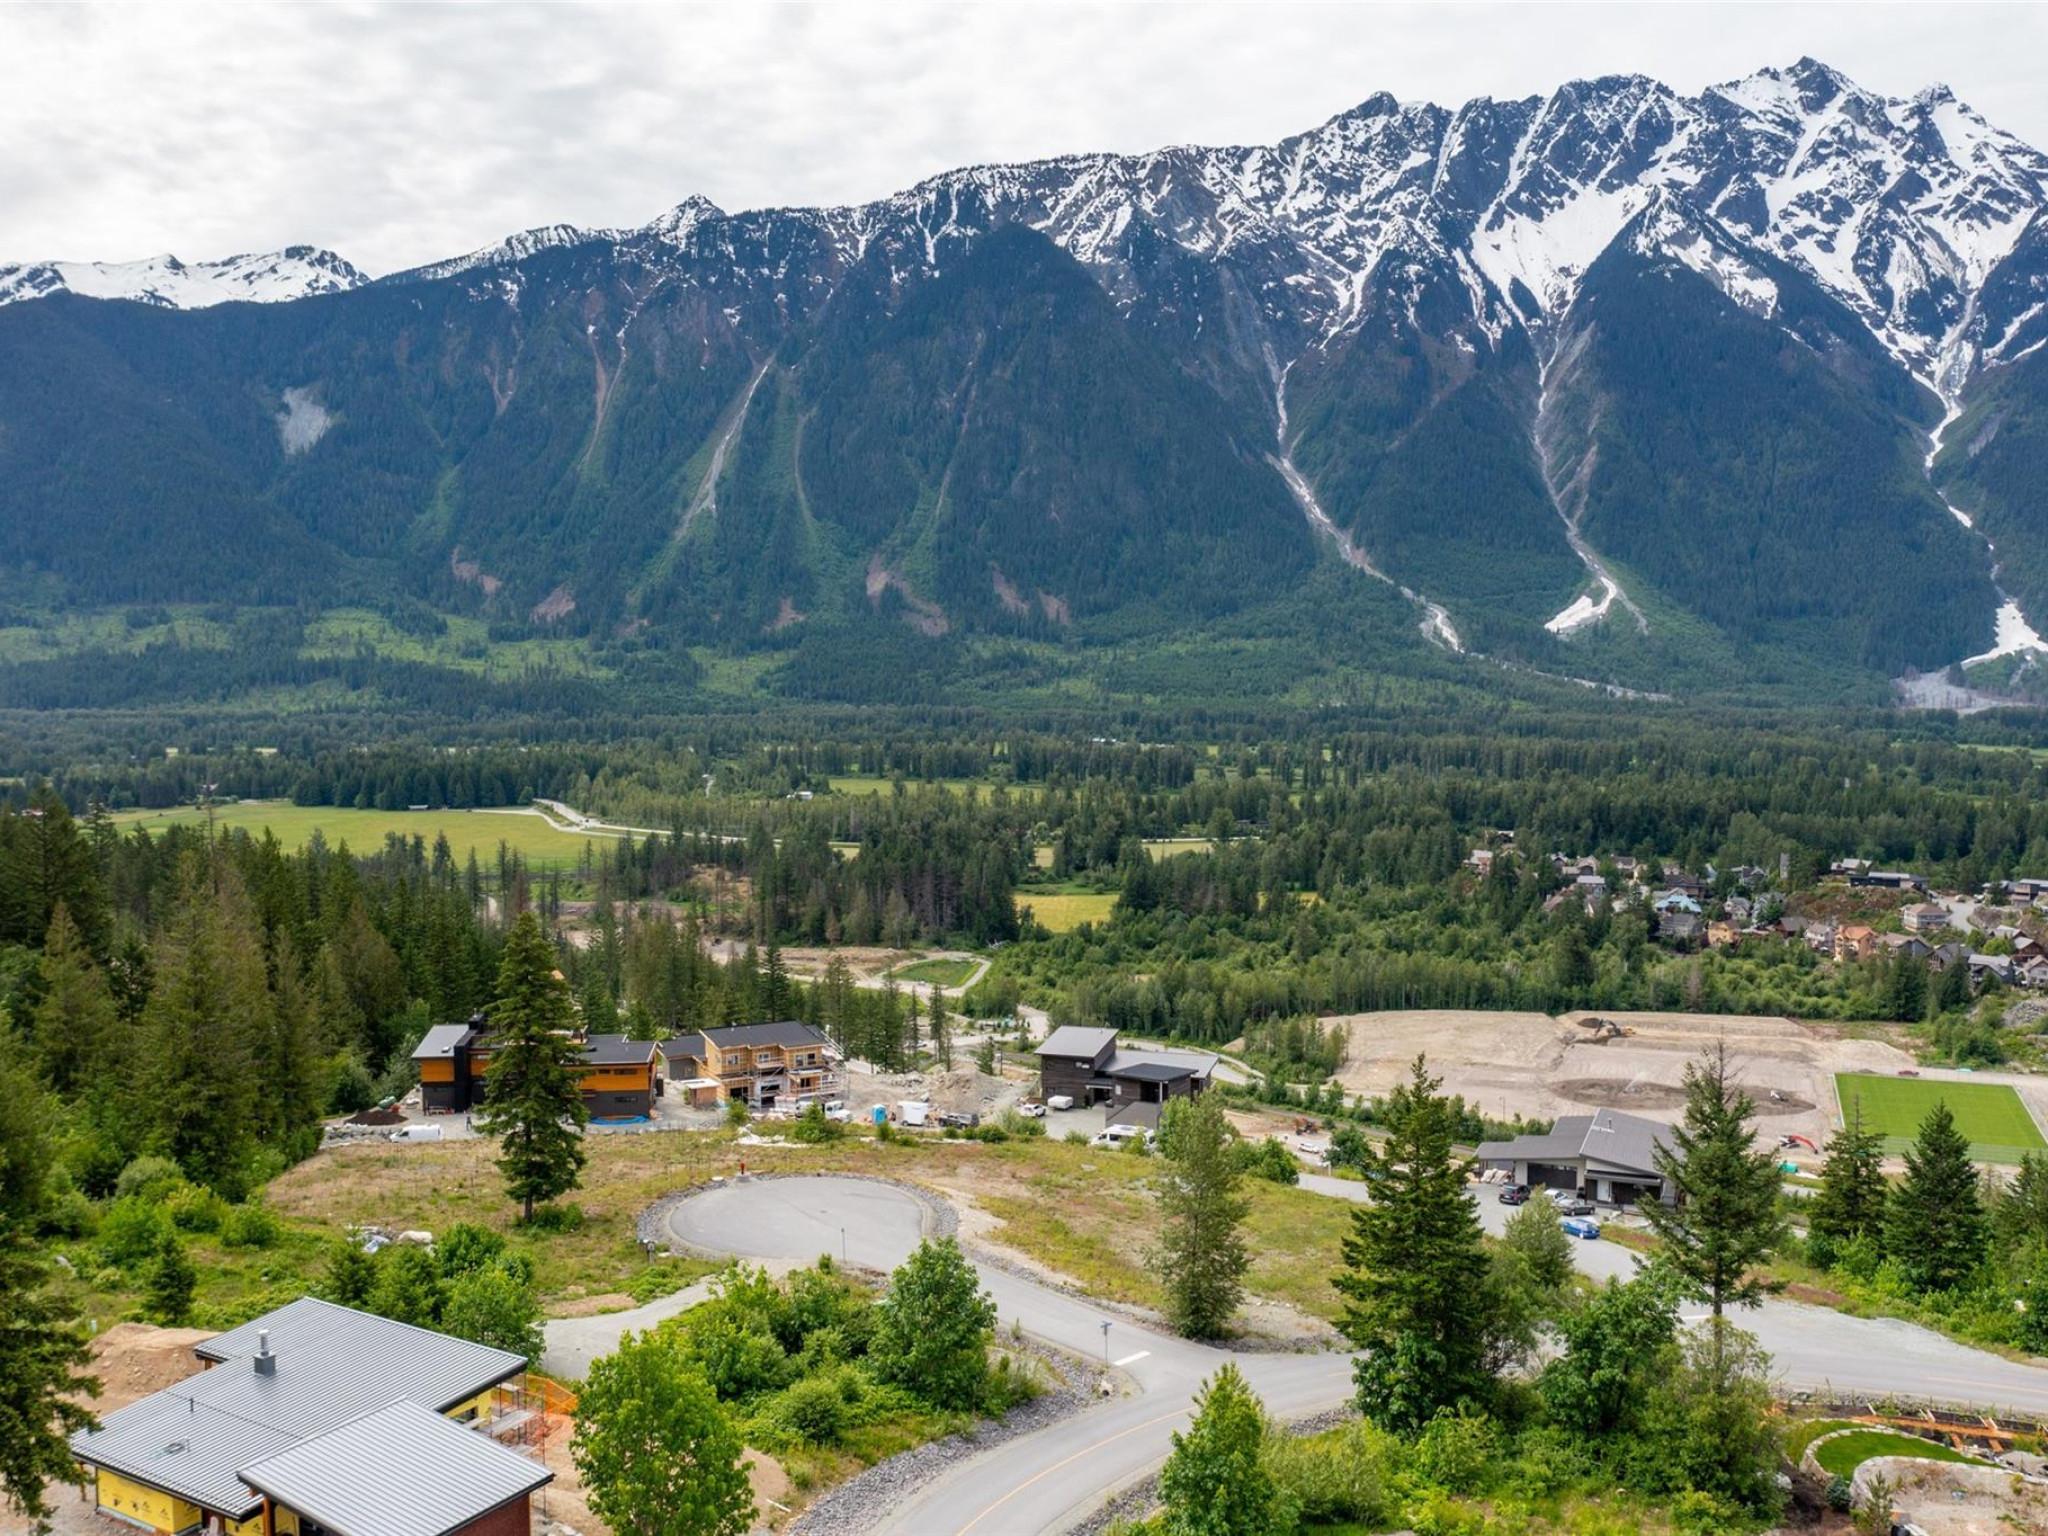 1608 Sisqa Peak  image 11